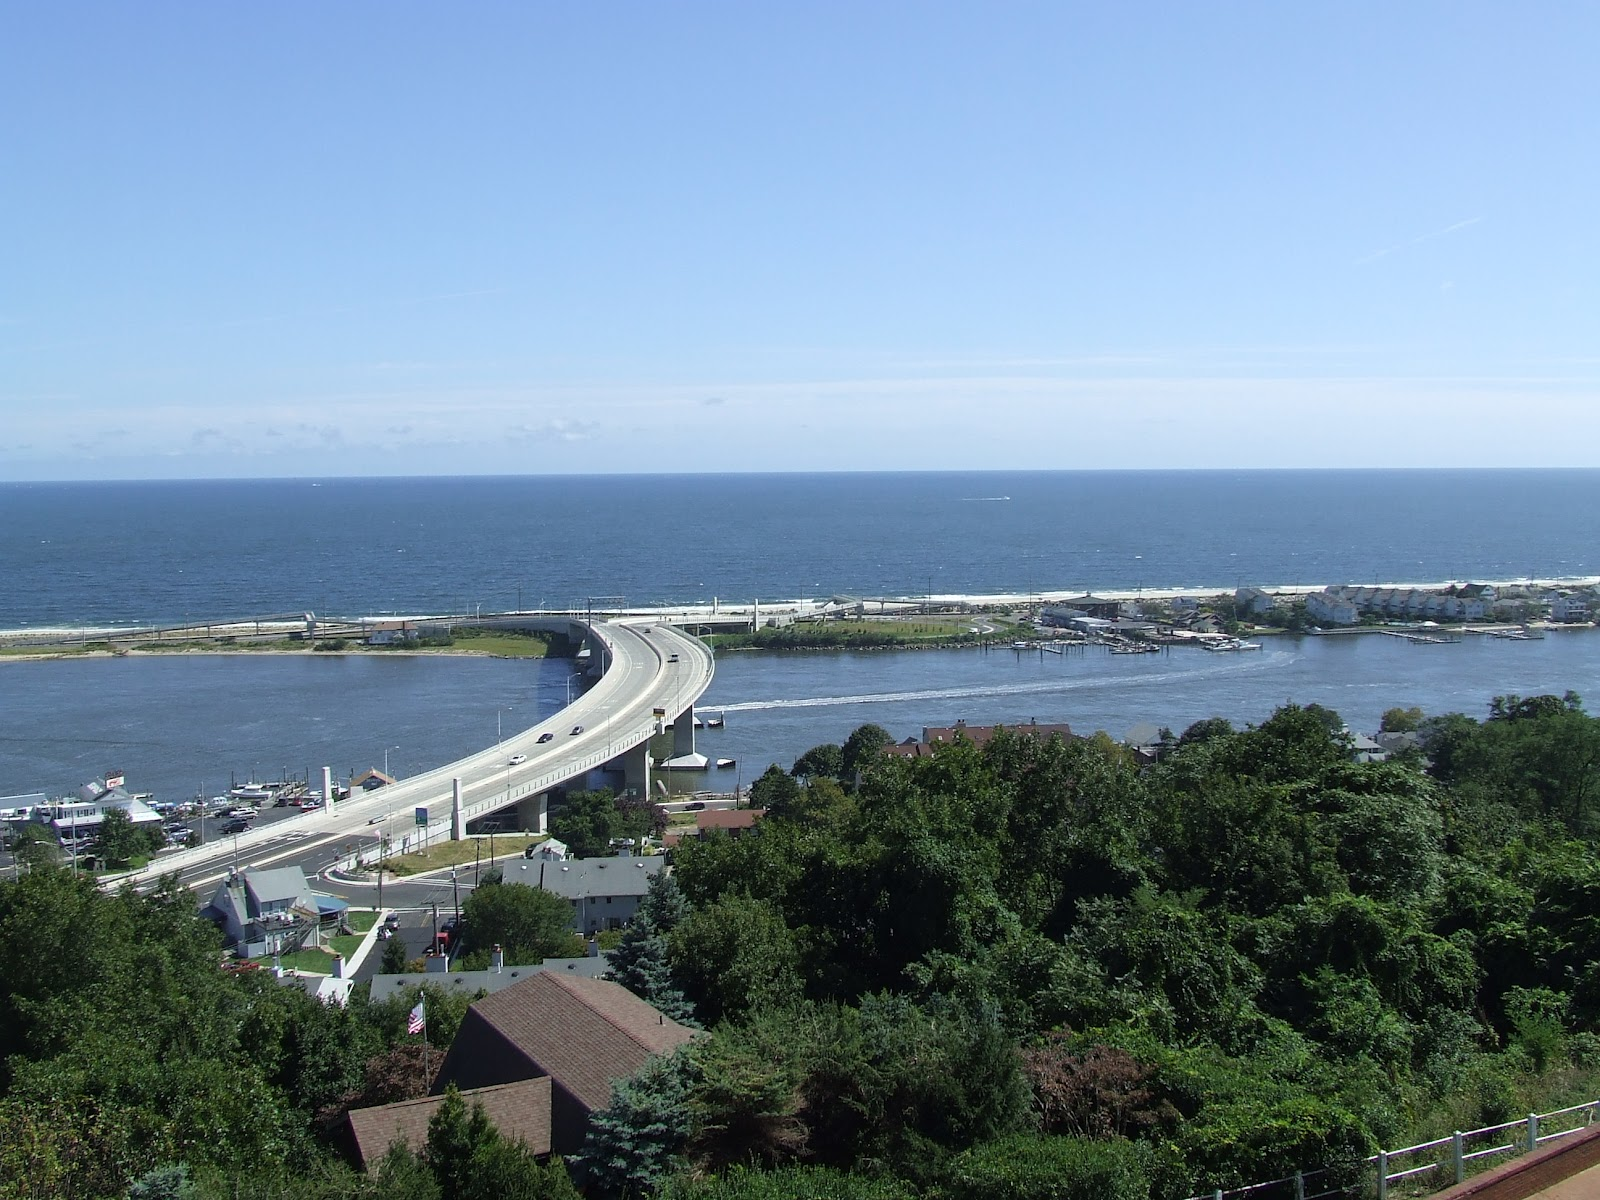 atlantic highlands Location and details for the atlantic highlands, nj seastreak ferry port.